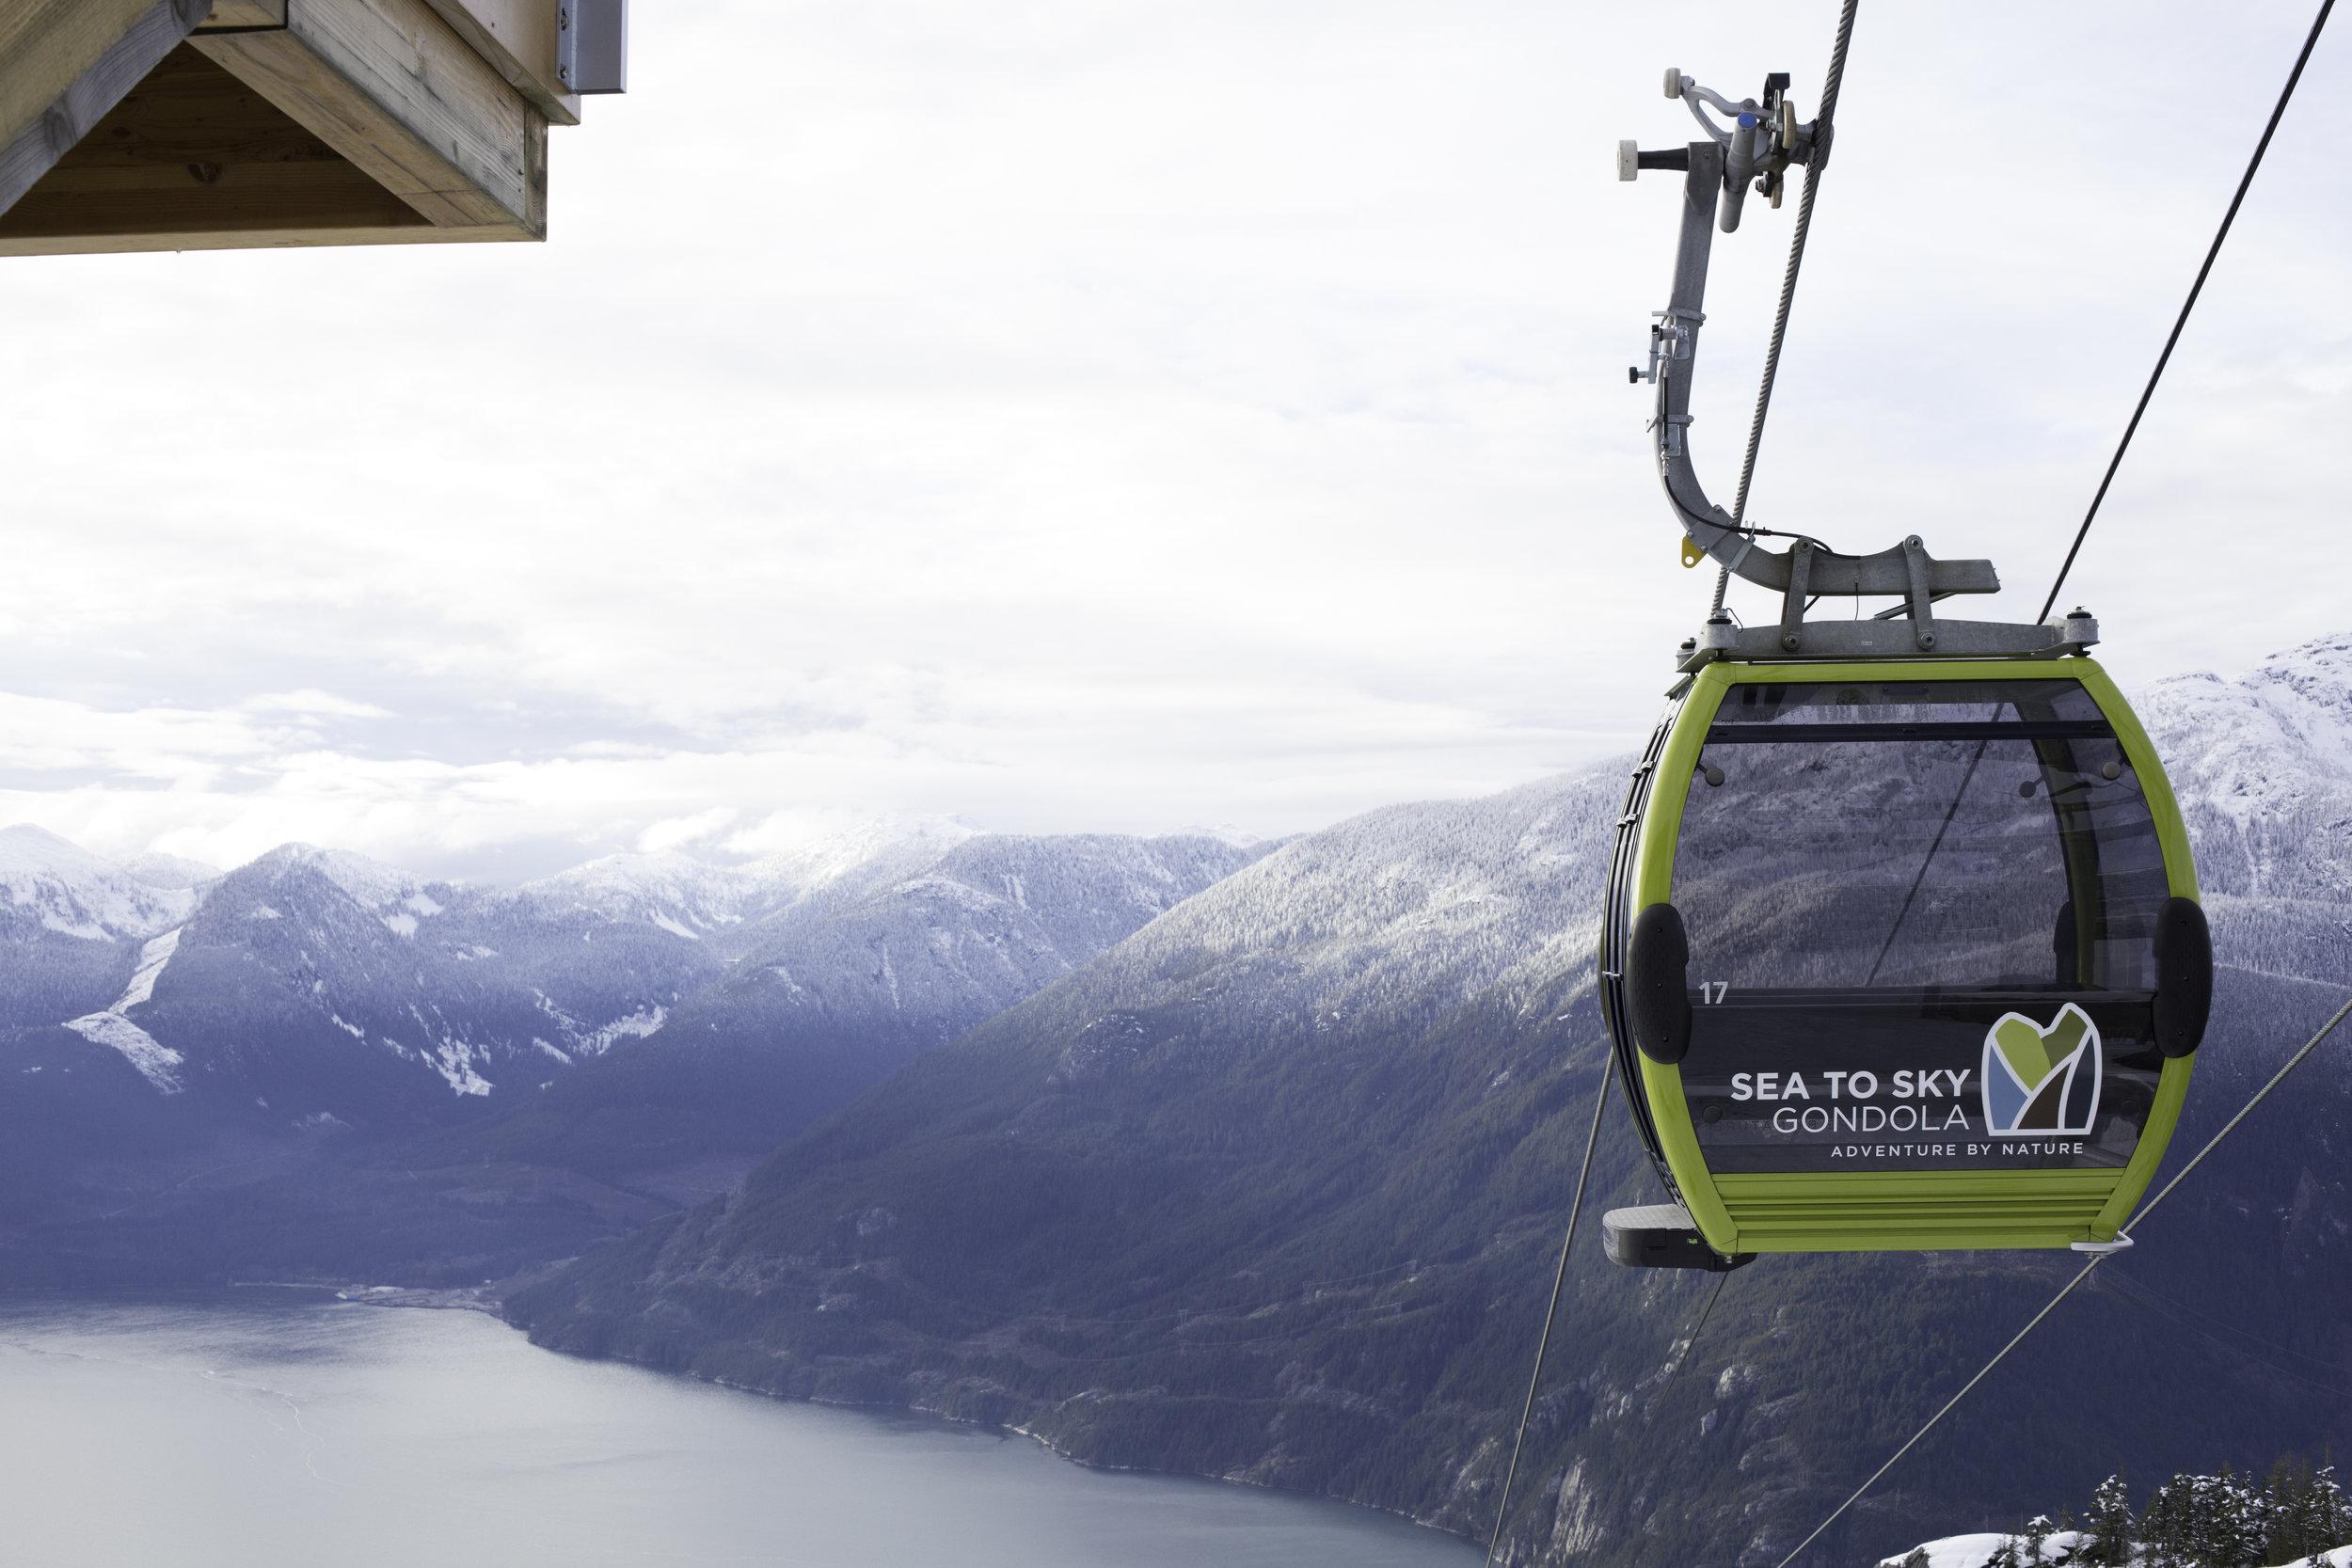 for Sea to Sky Gondola